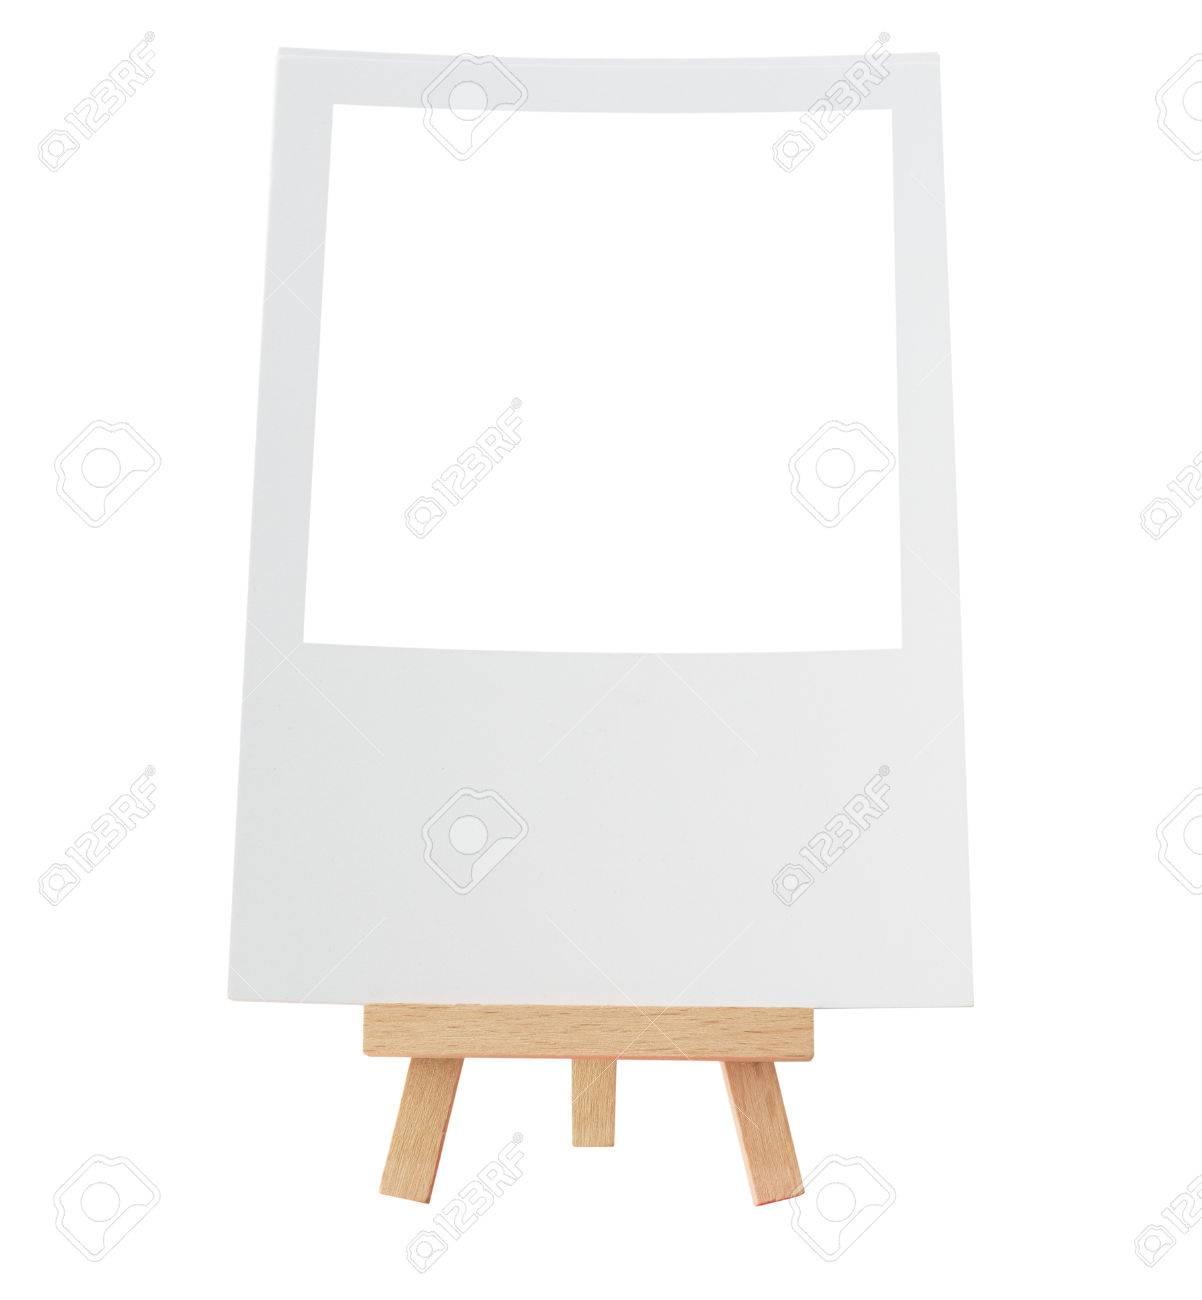 Fein 11x14 Rahmen Weiß Galerie - Benutzerdefinierte Bilderrahmen ...